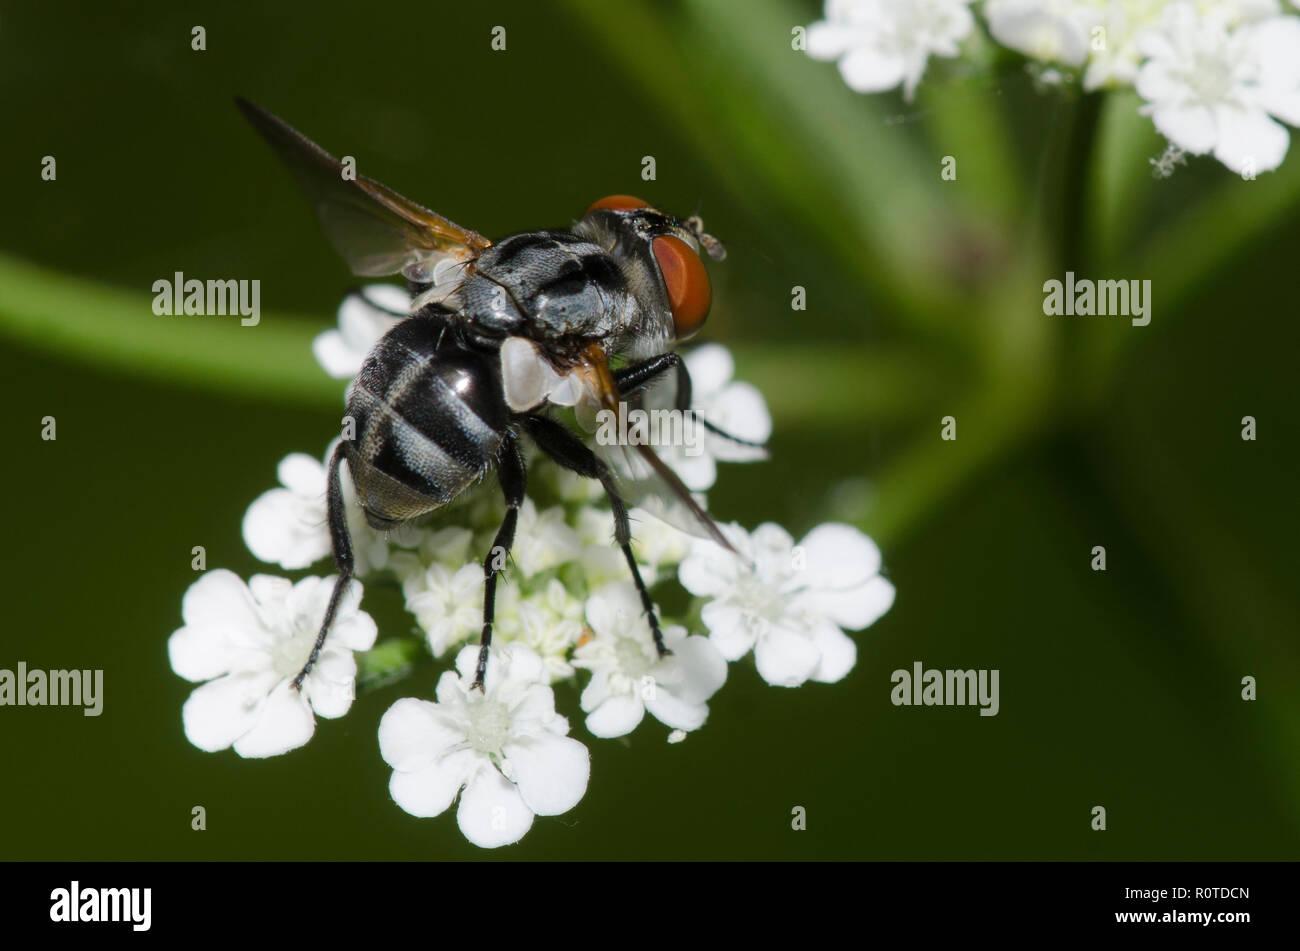 Tachinid fly, Gymnoclytia occidua, female Stock Photo